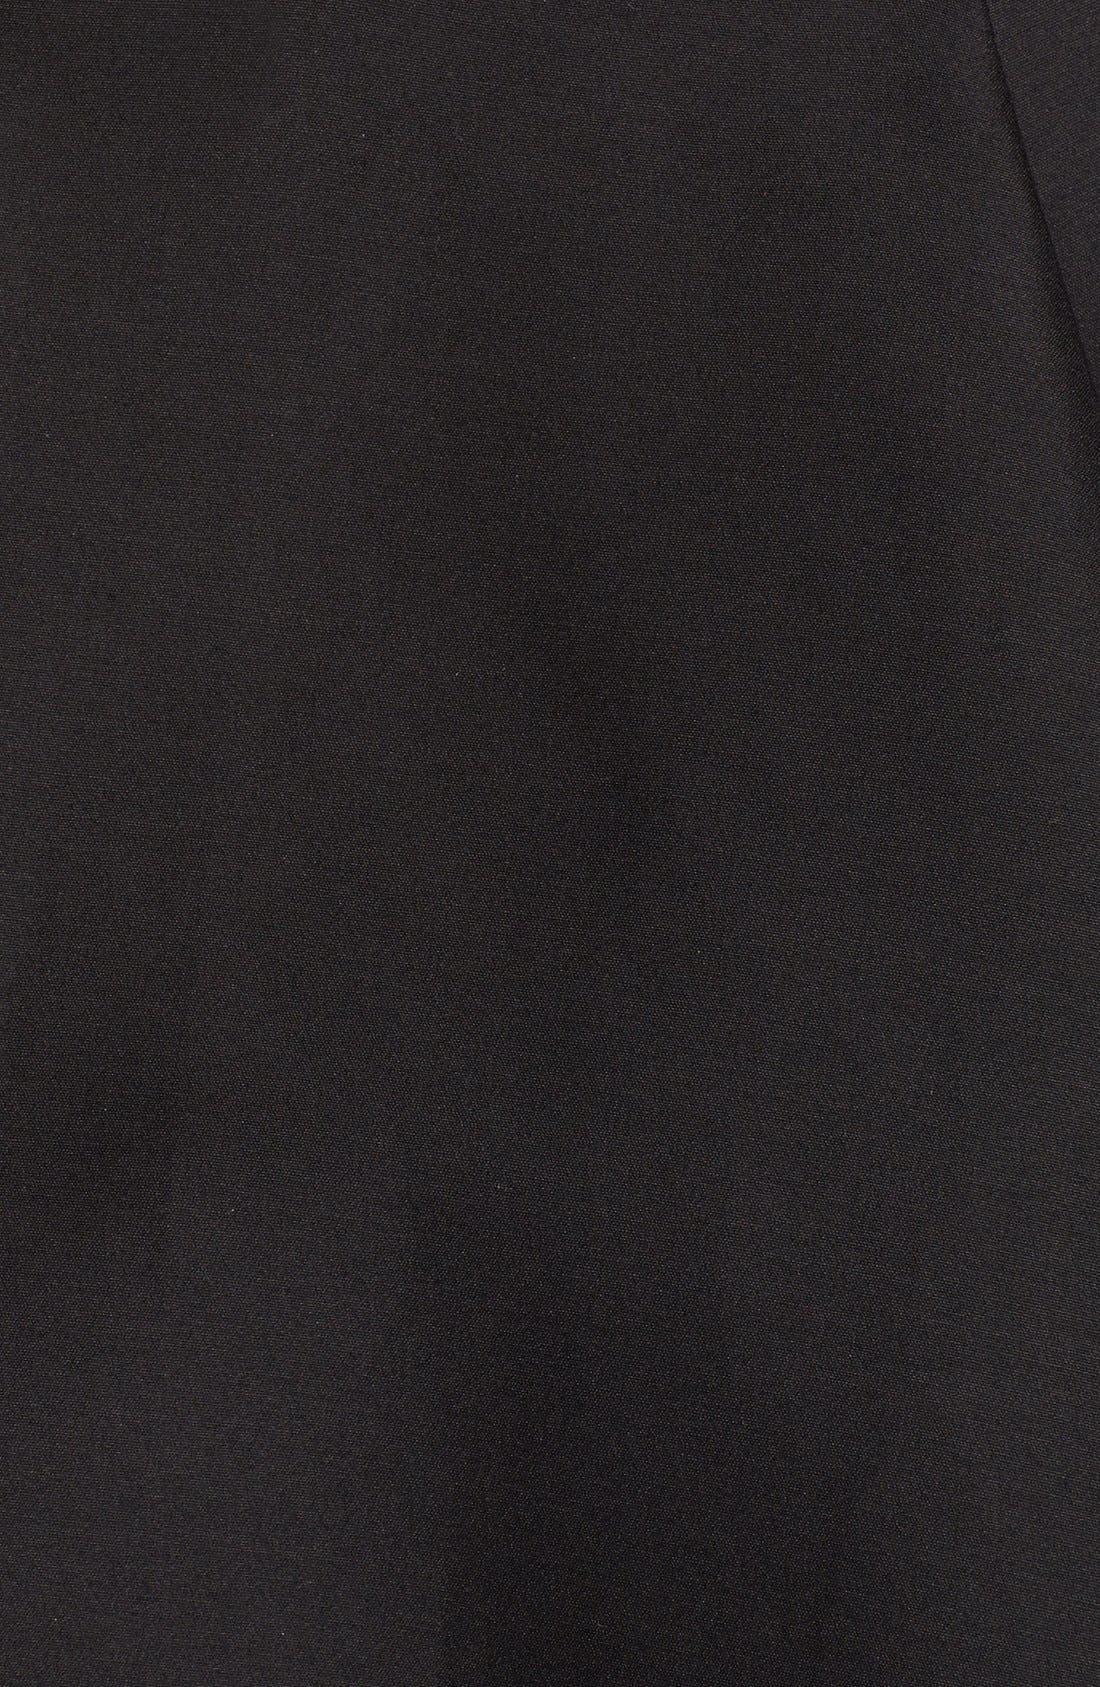 Alternate Image 3  - Halston Heritage Strapless Fit & Flare Dress